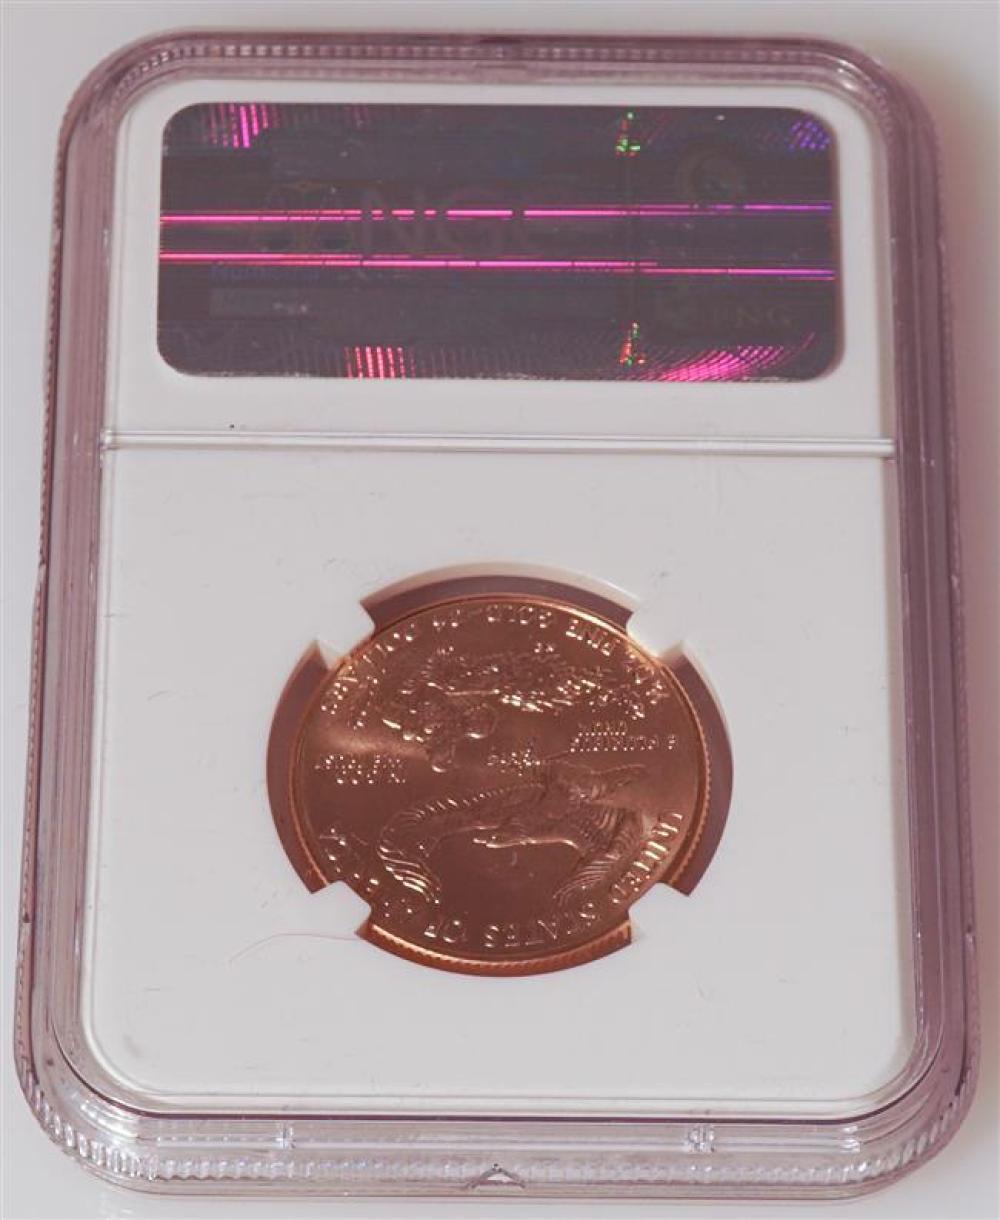 U.S. 1999 American Eagle Twenty-Five Dollar Gold Coin